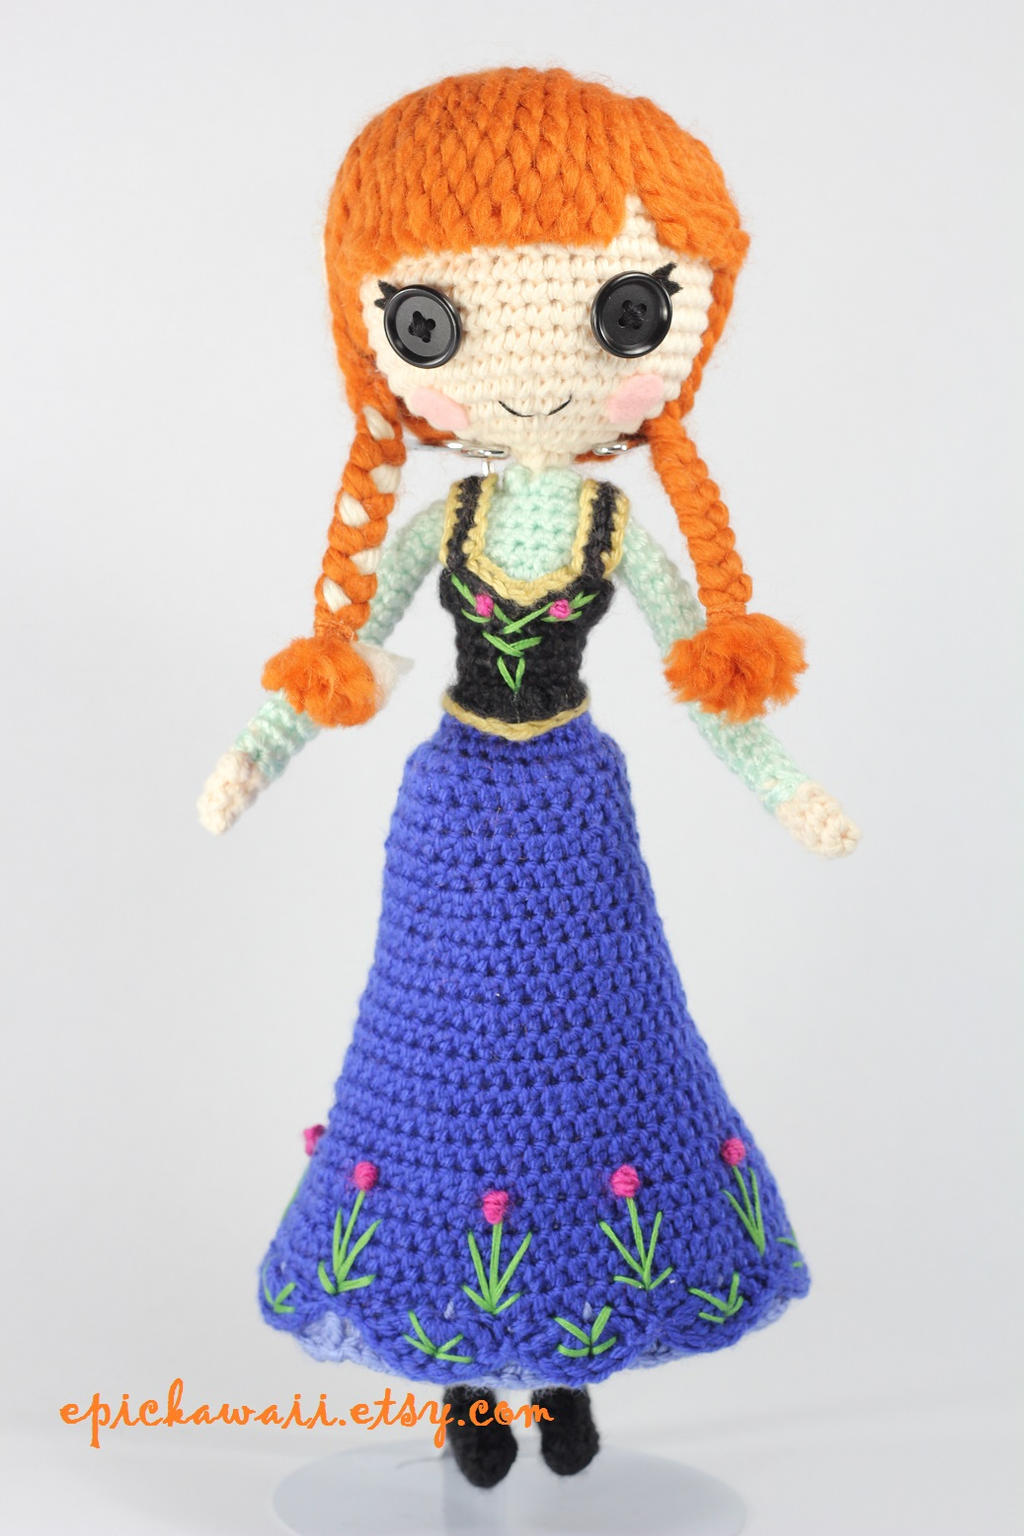 Crochet Frozen Anna Doll : Princess Anna from Disneys Frozen Amigurumi Doll by ...